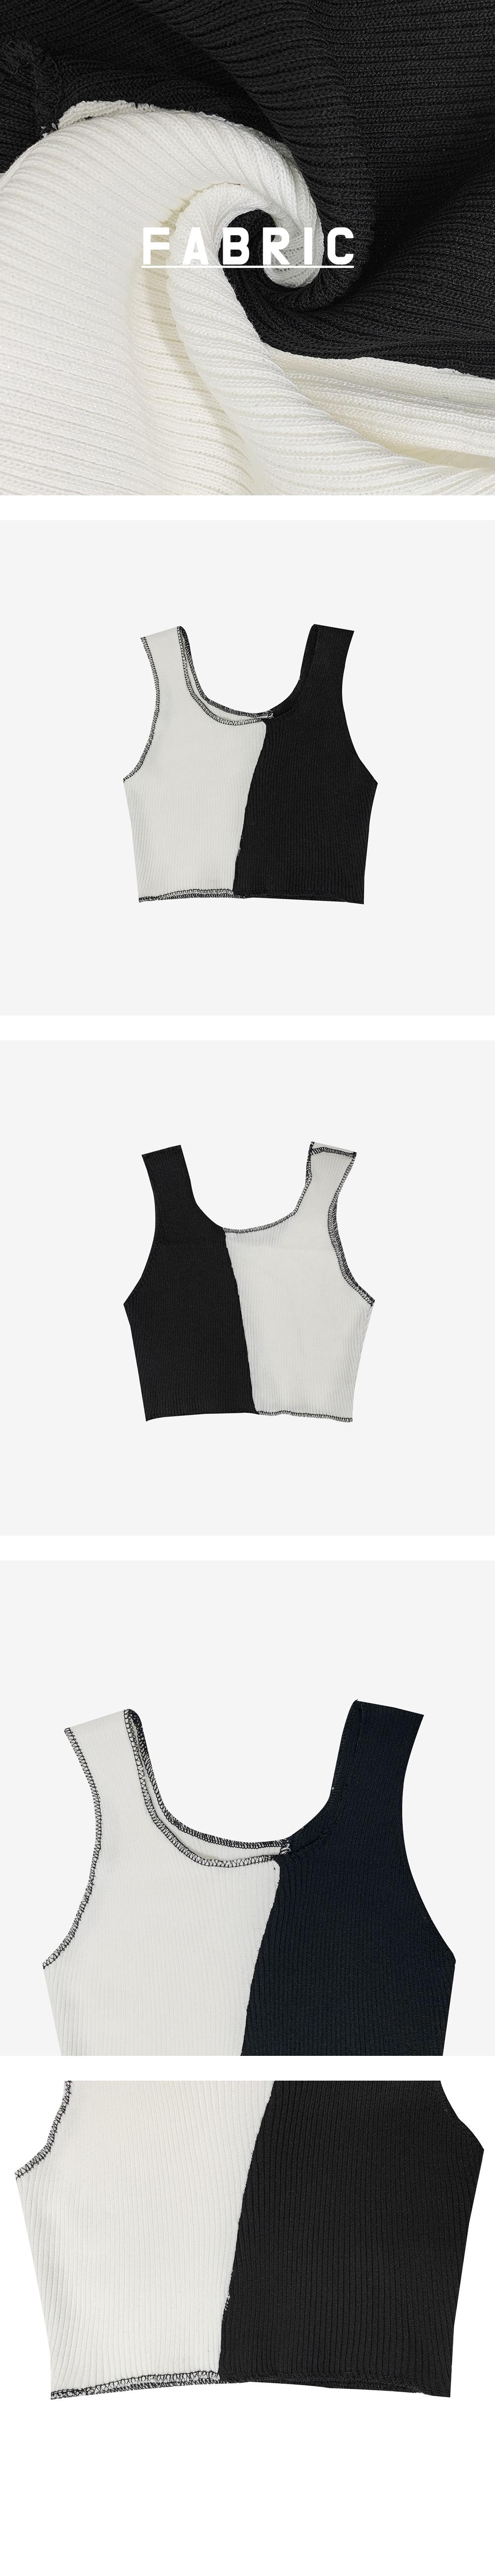 Army half color matching sleeveless